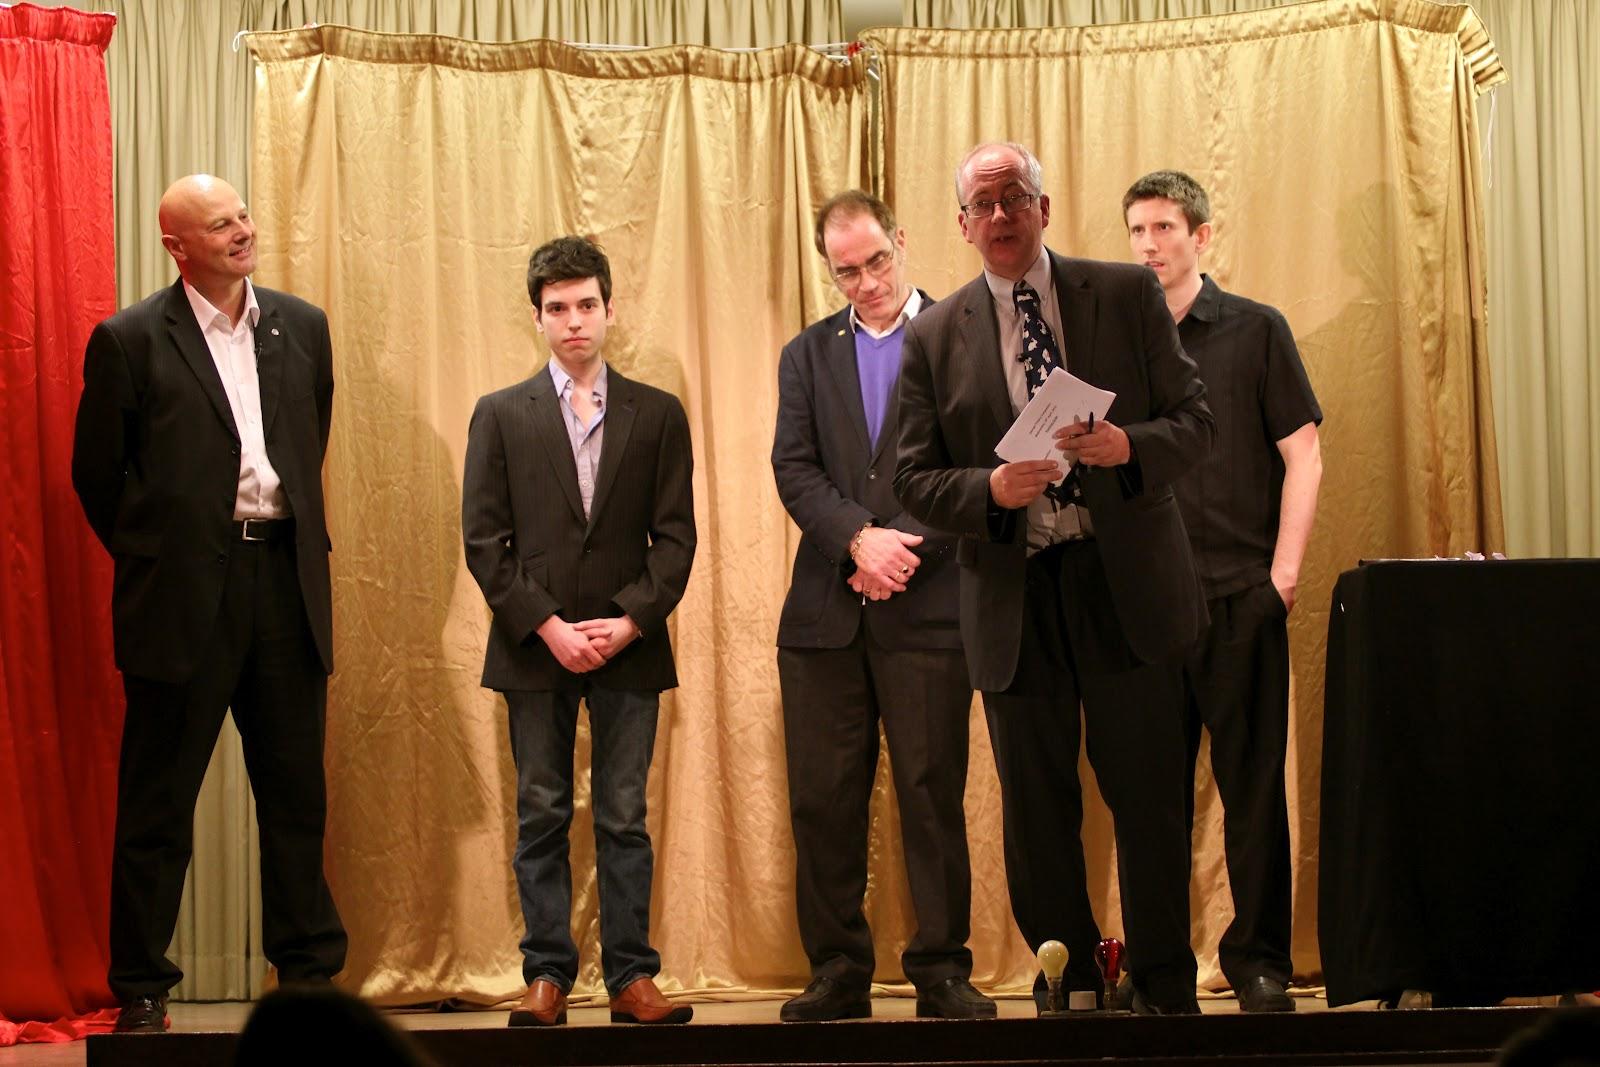 (L-R) Roberto Forzoni, Edward Hilsum, Adrian Sels, Kevin Doig (Compere) & Mark Speller.